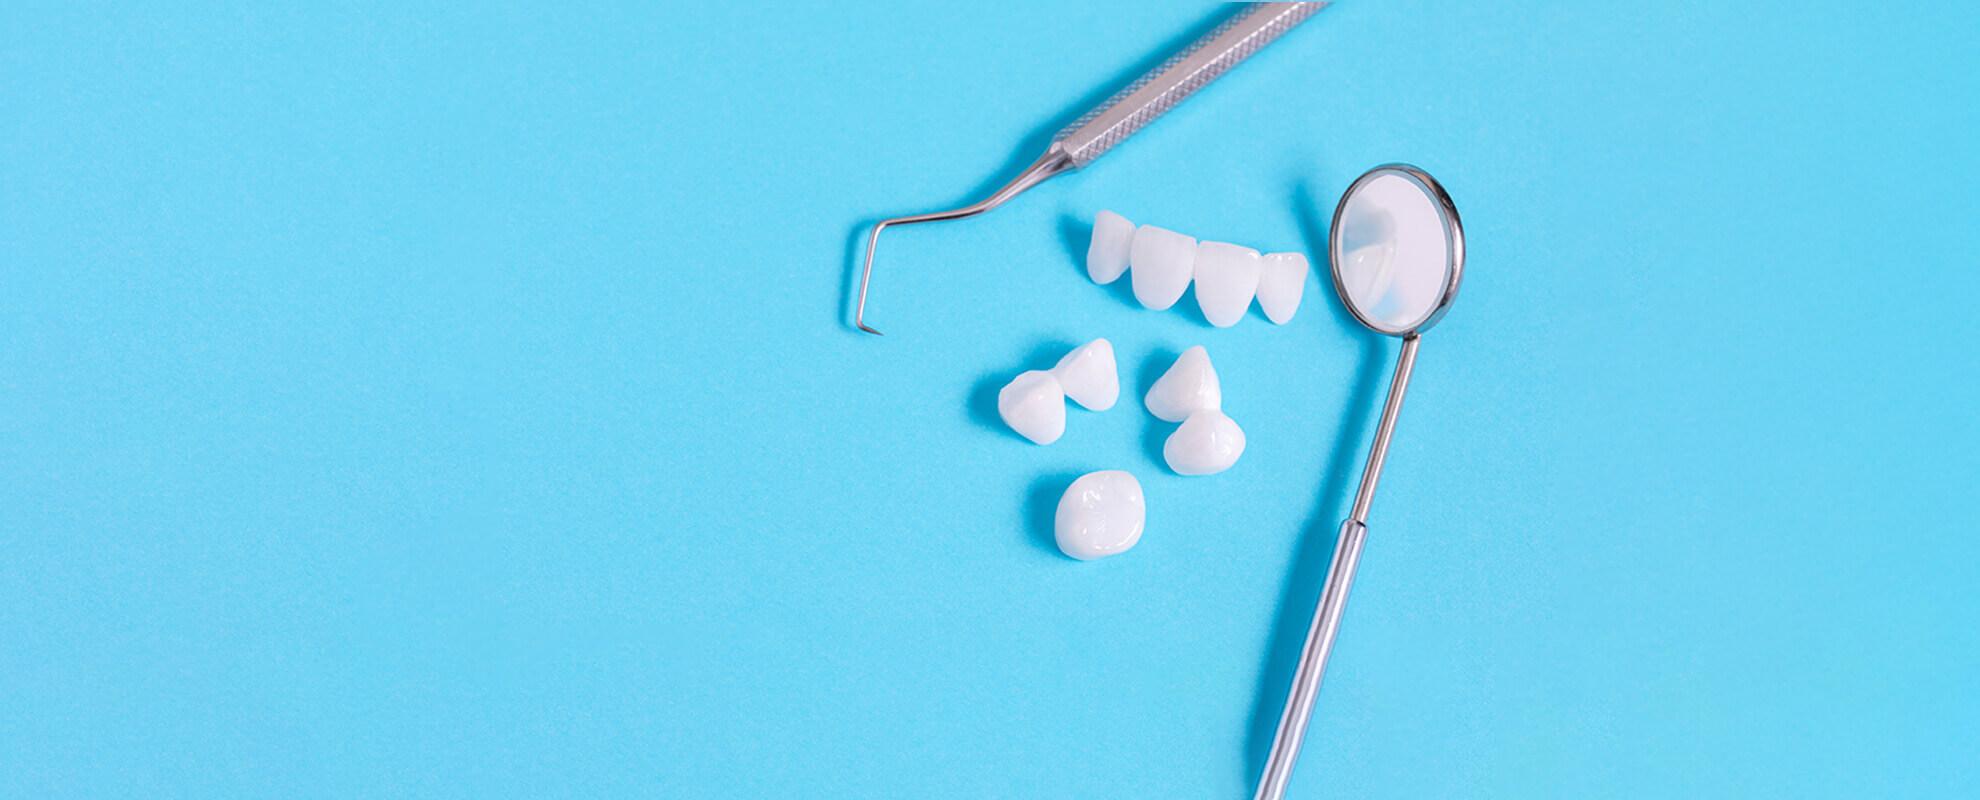 dental technicians